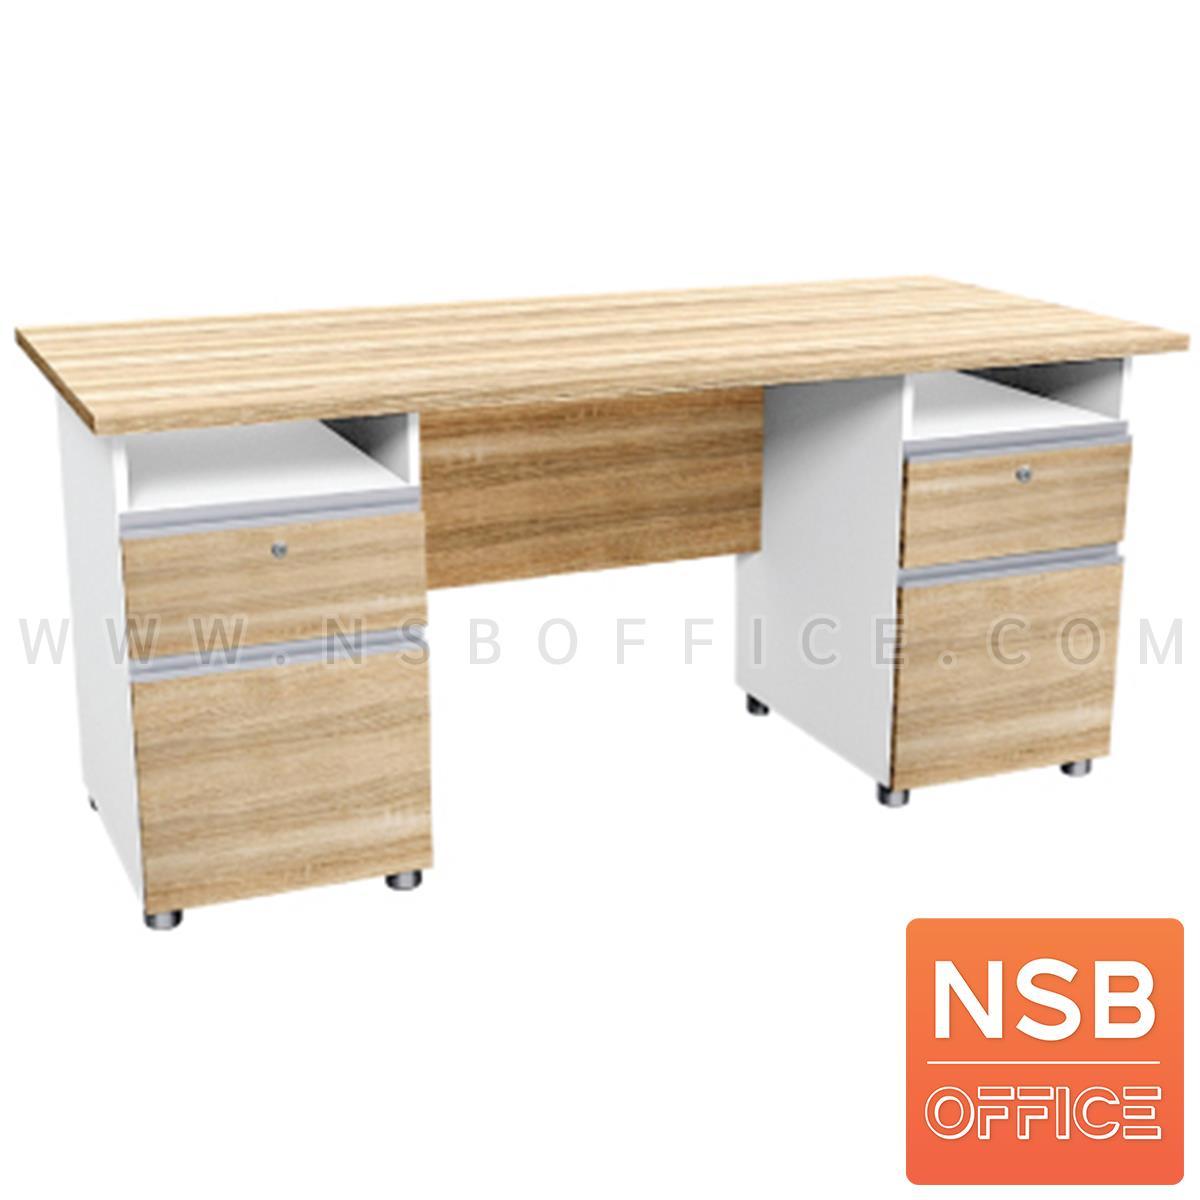 A21A003:โต๊ะทำงาน 4 ลิ้นชัก  รุ่น Rebelle (เรอเบลล์) ขนาด 180W cm. เมลามีน สีเนเจอร์ทีค-ขาว